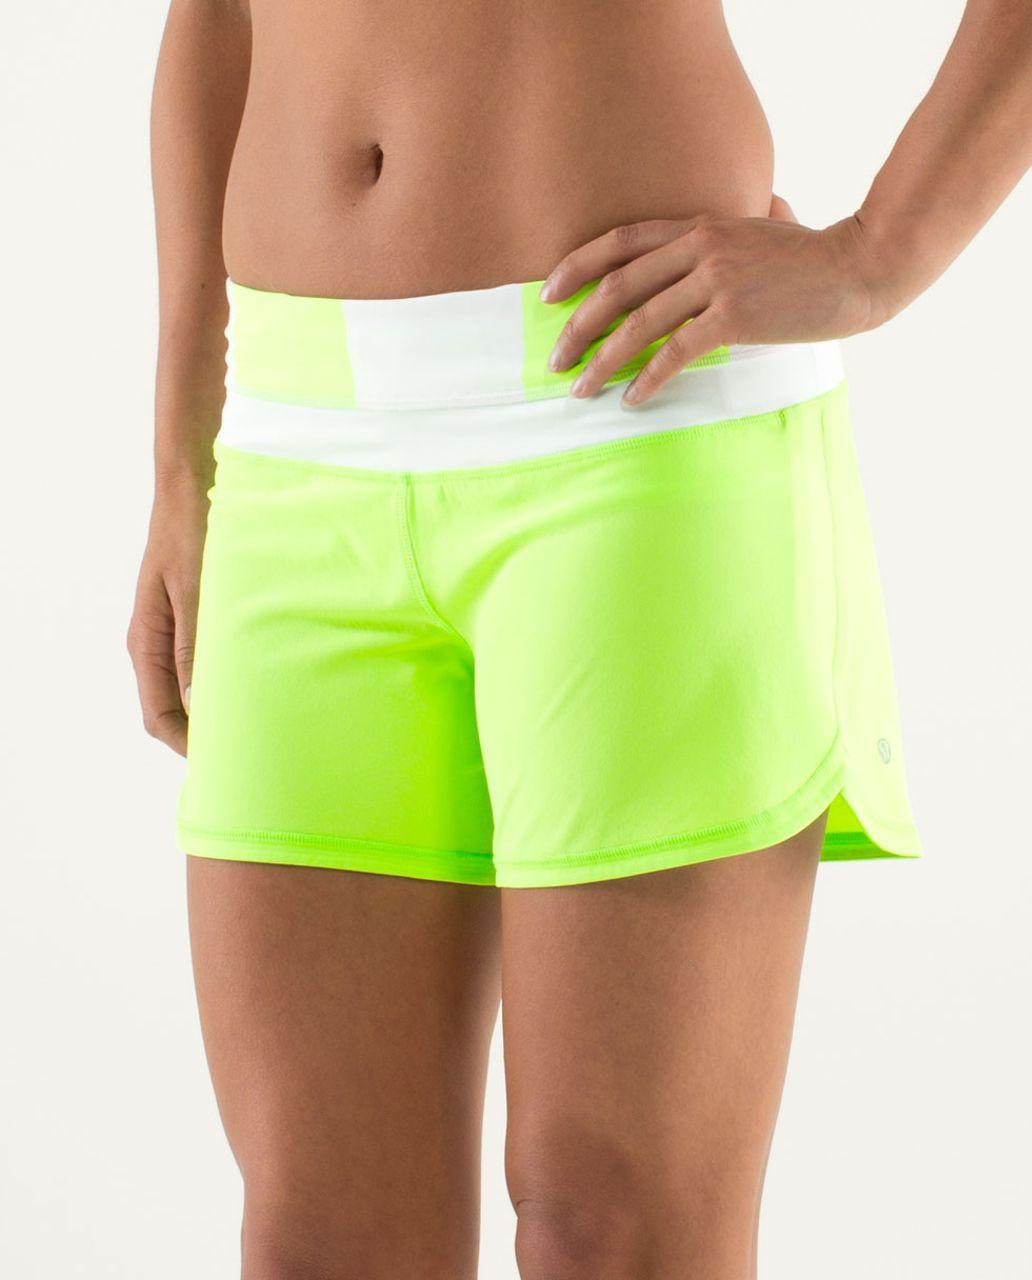 Lululemon Groovy Run Short - Zippy Green / White / Bold Stripe Zippy Green